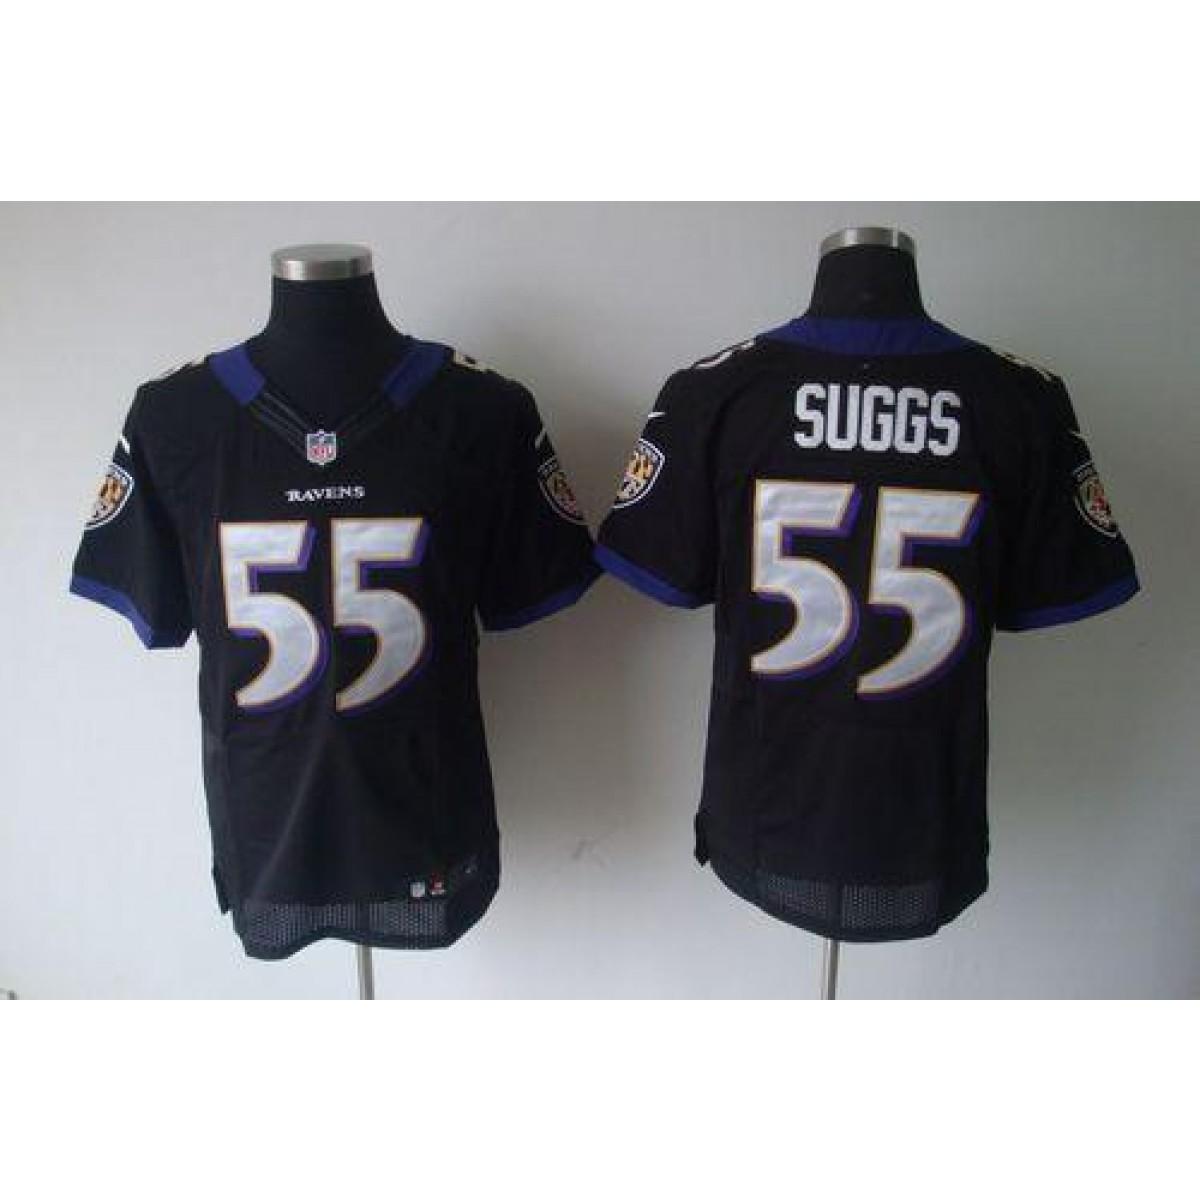 1020cc3a0df nike ravens 55 terrell suggs black alternate men s embroidered nfl elite jersey.jpg